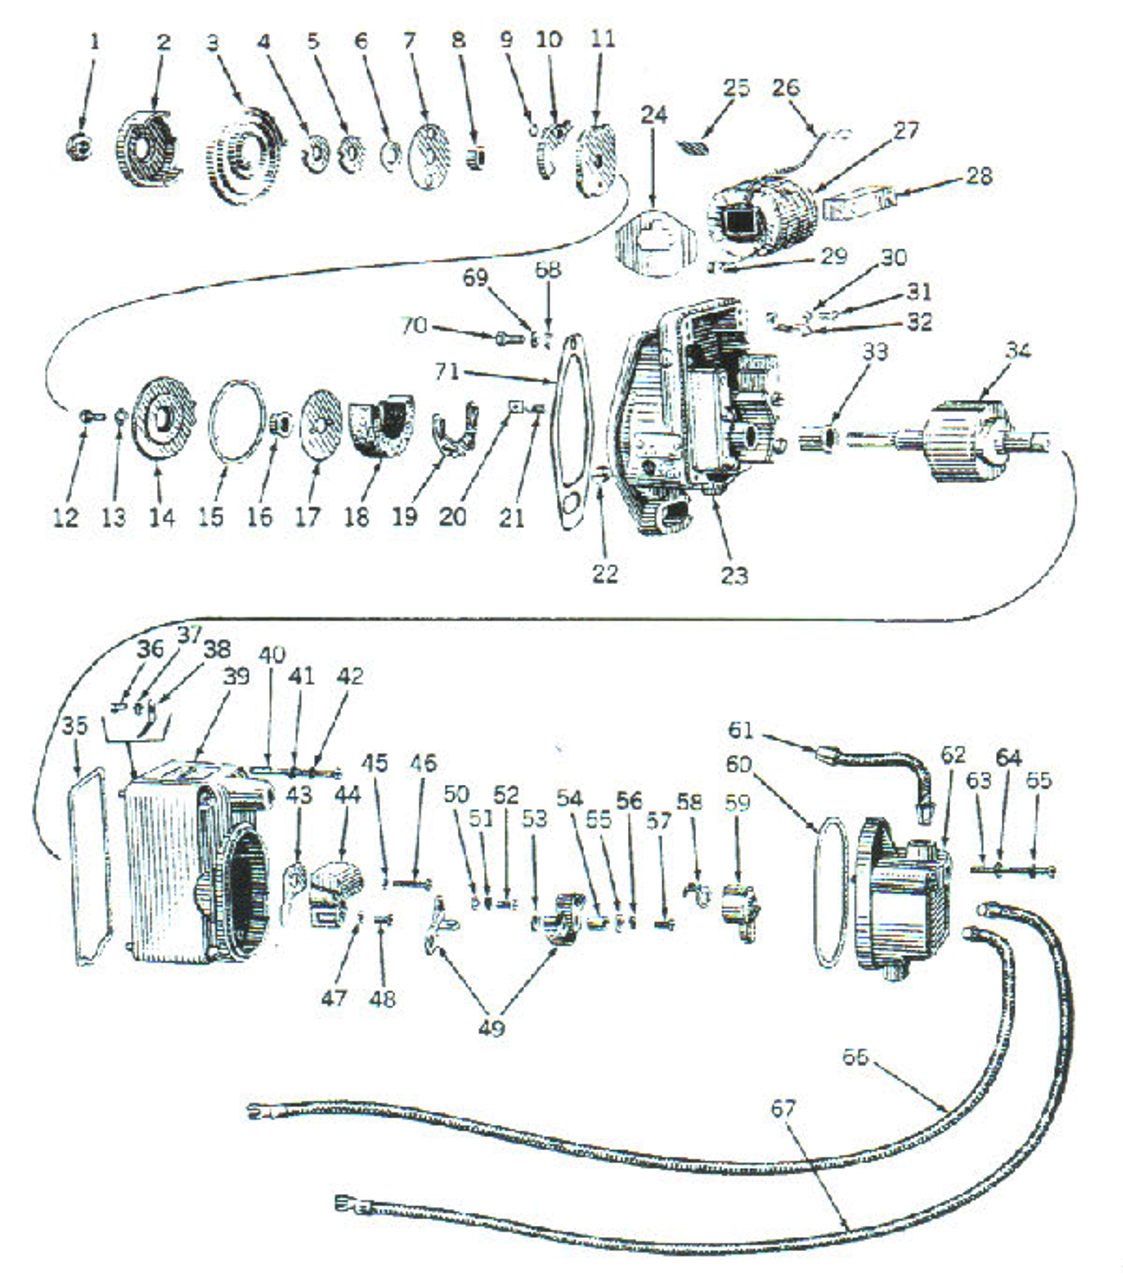 Wico Magneto Wiring Schematic -Club Car Electrical Diagram | Begeboy Wiring  Diagram Source | Wico Magneto Wiring Schematic |  | Bege Wiring Diagram - Begeboy Wiring Diagram Source